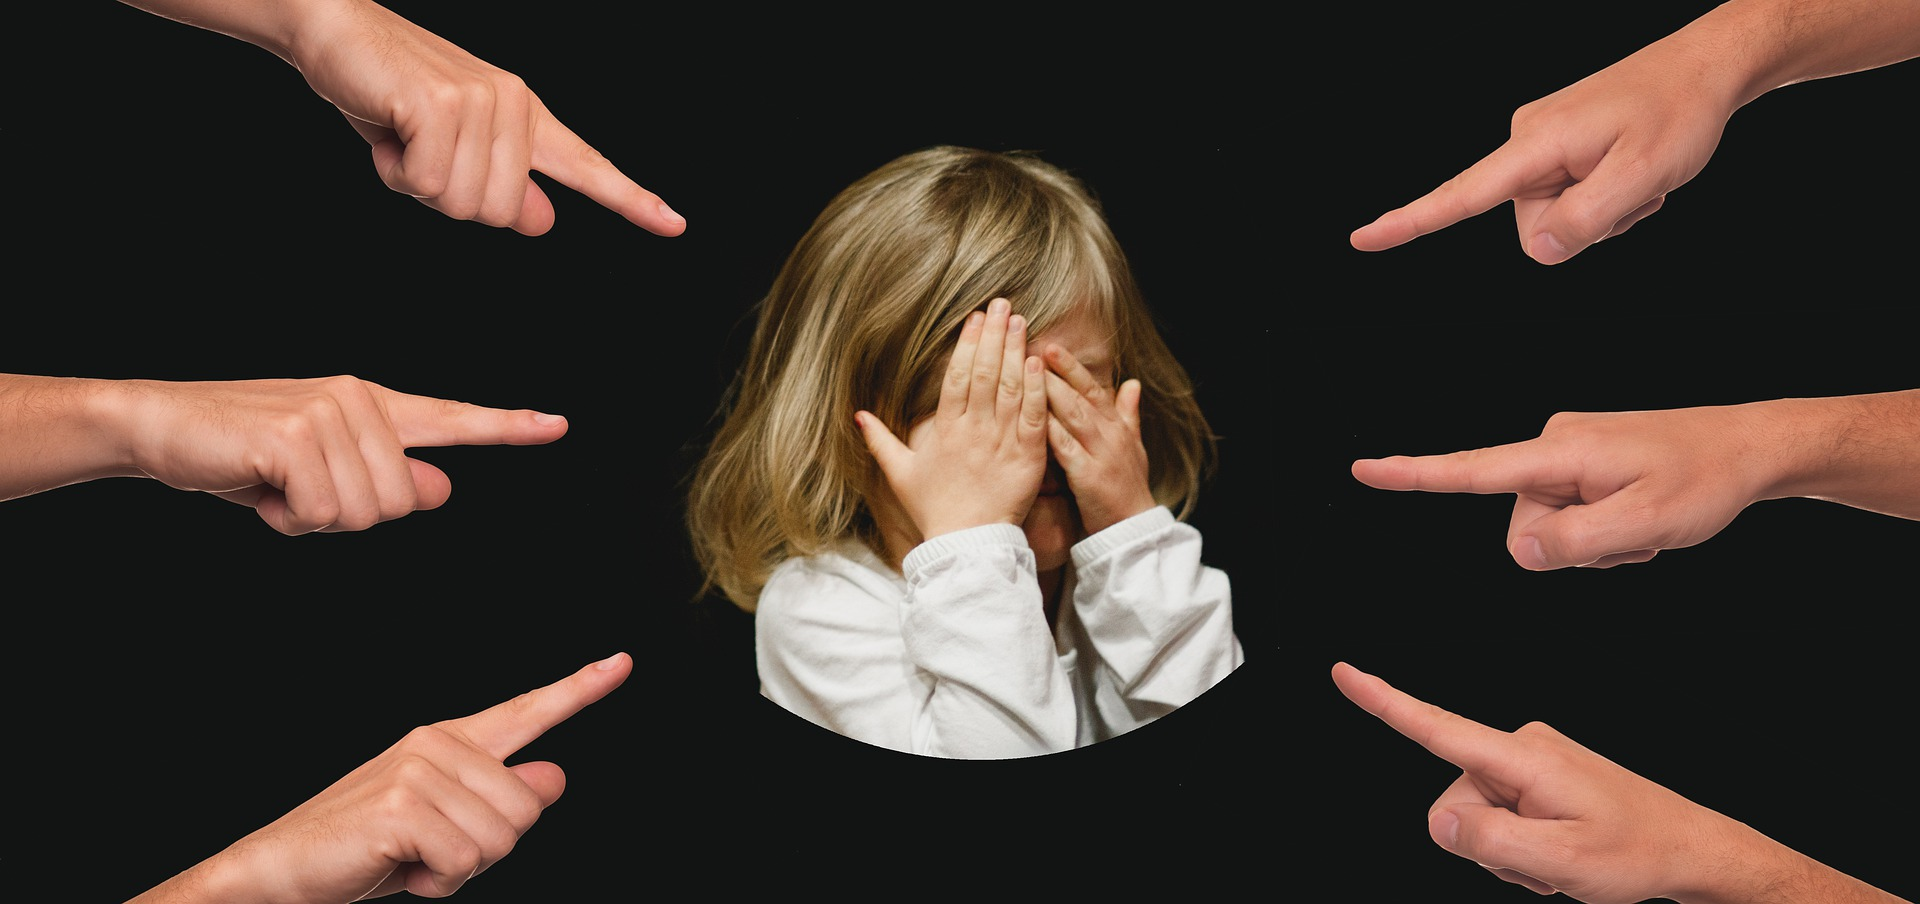 Bullied Little Girl | Kids Car Donations